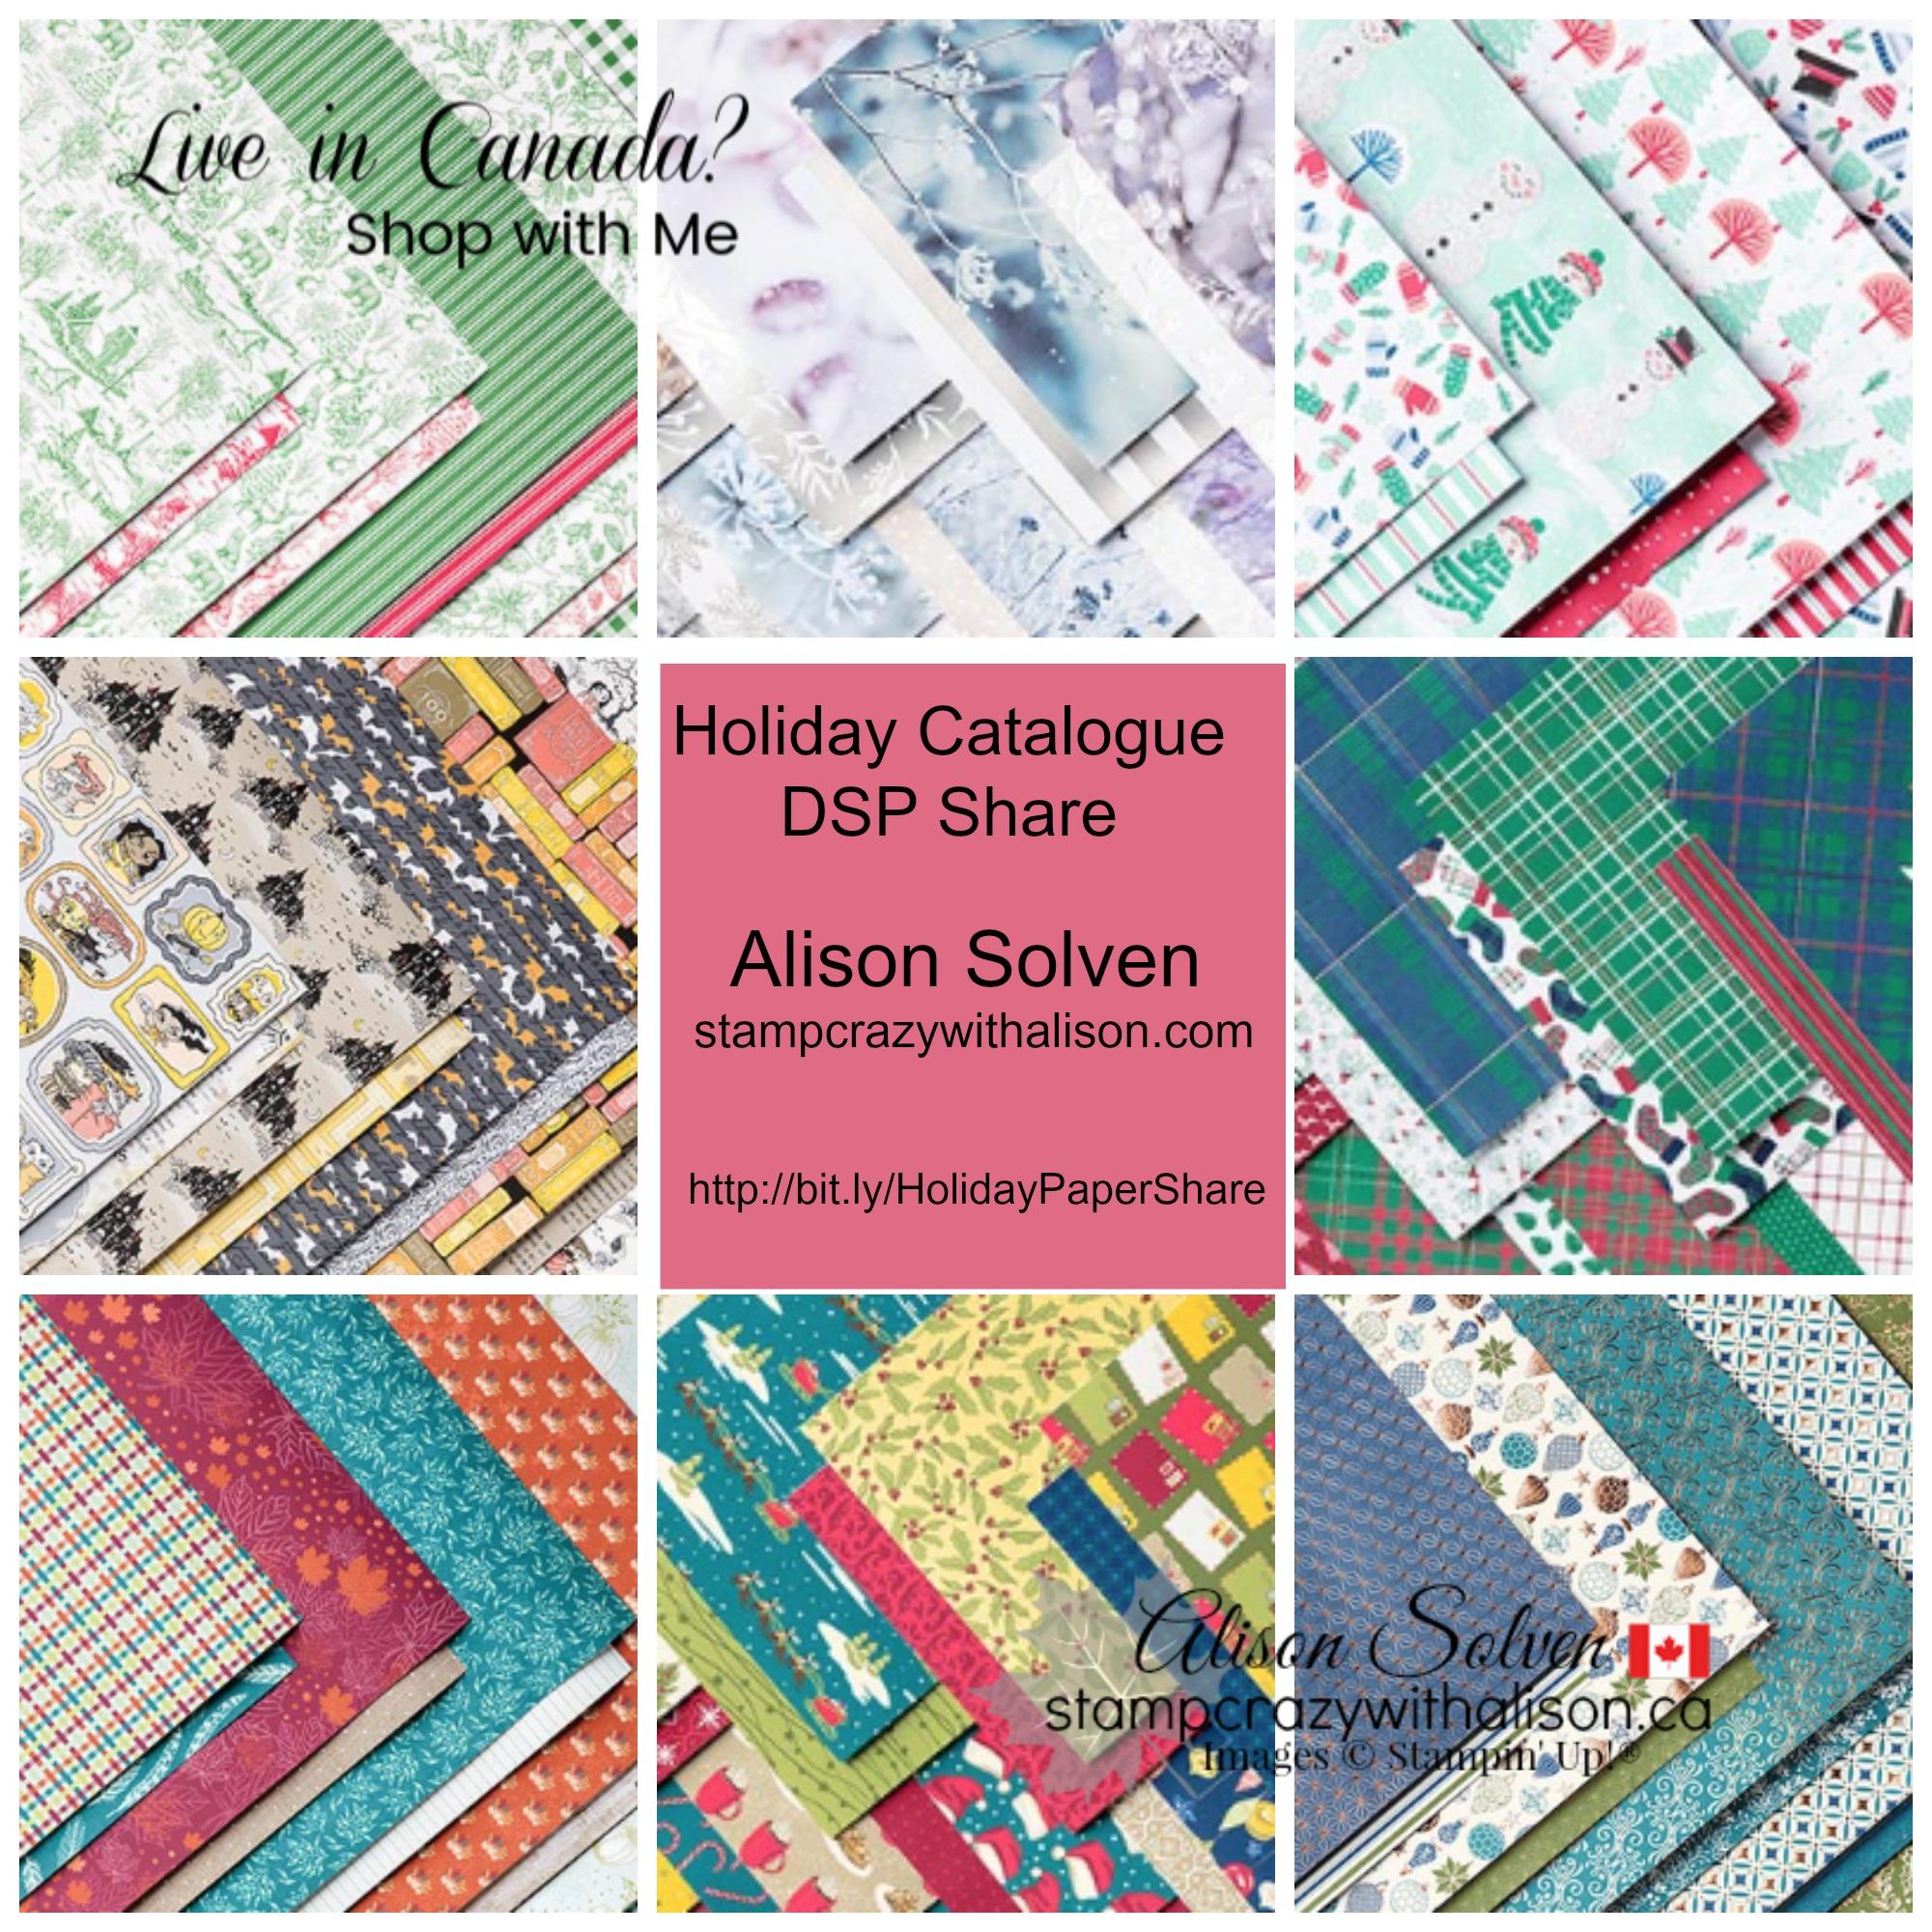 Holiday Catalogue Designer Series Paper Share